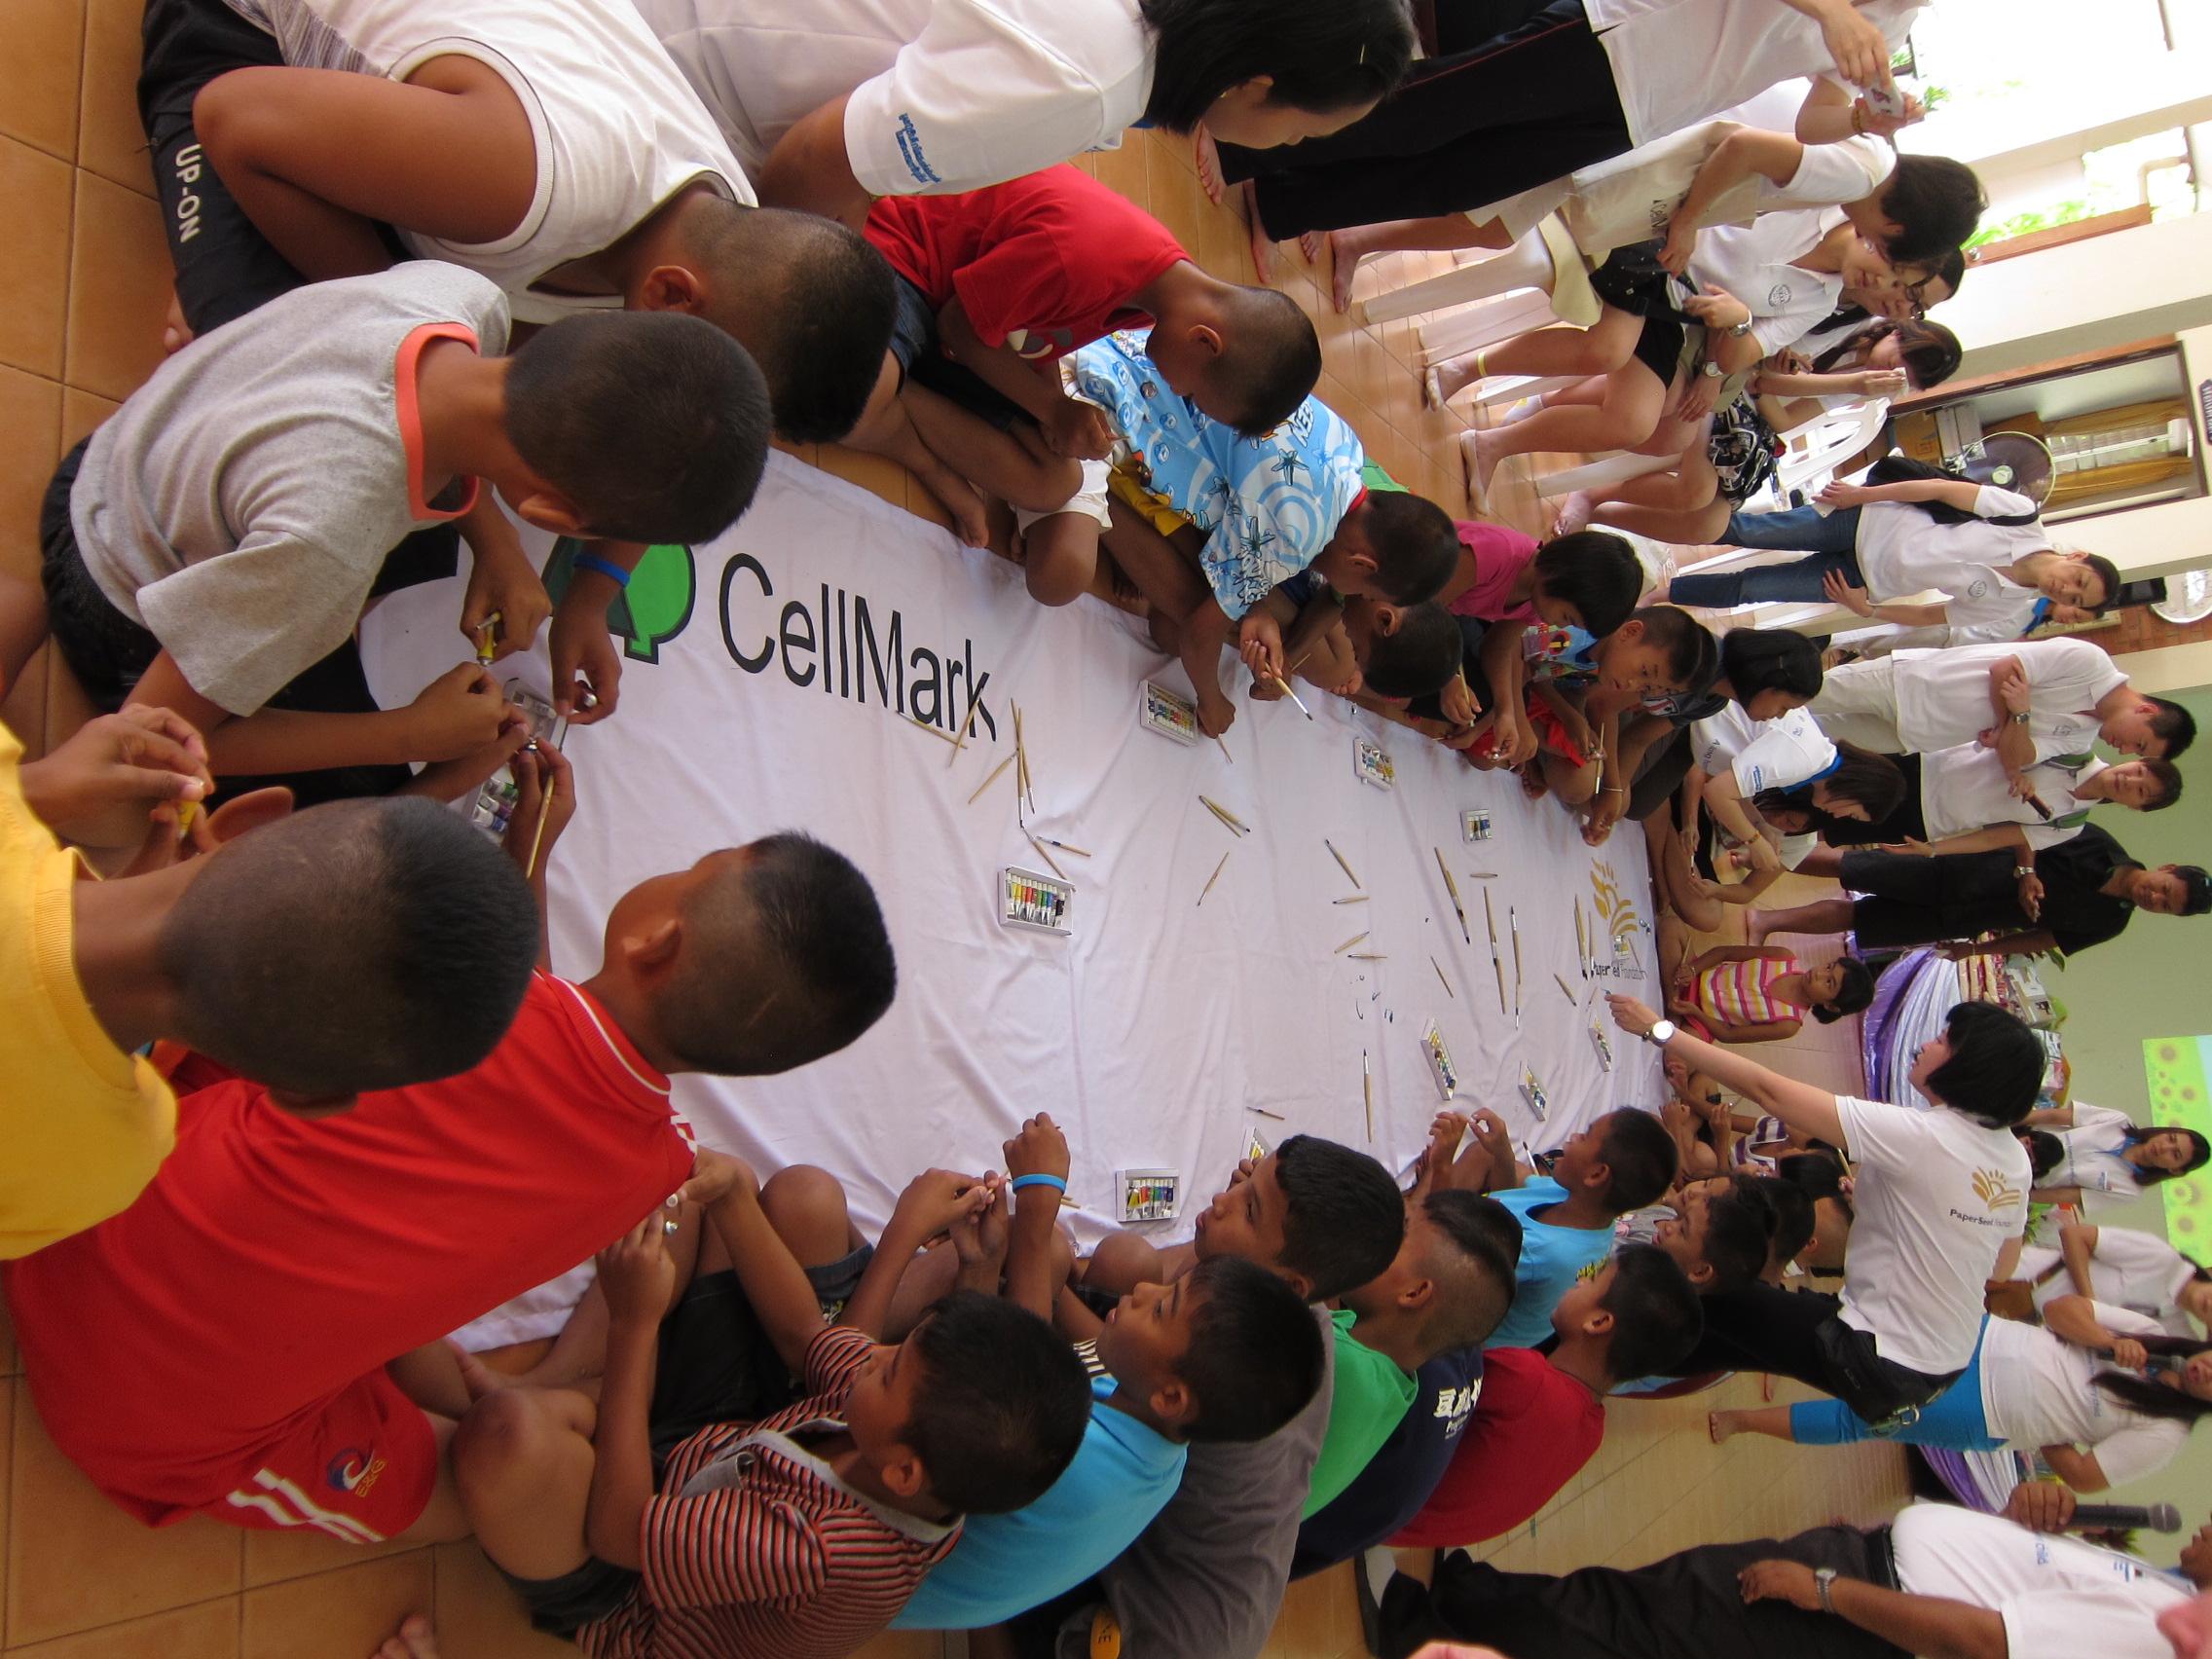 Creating artwork with the children of SOS Children's Village and Phuket Sunshine Village orphanages in Phuket, Thailand